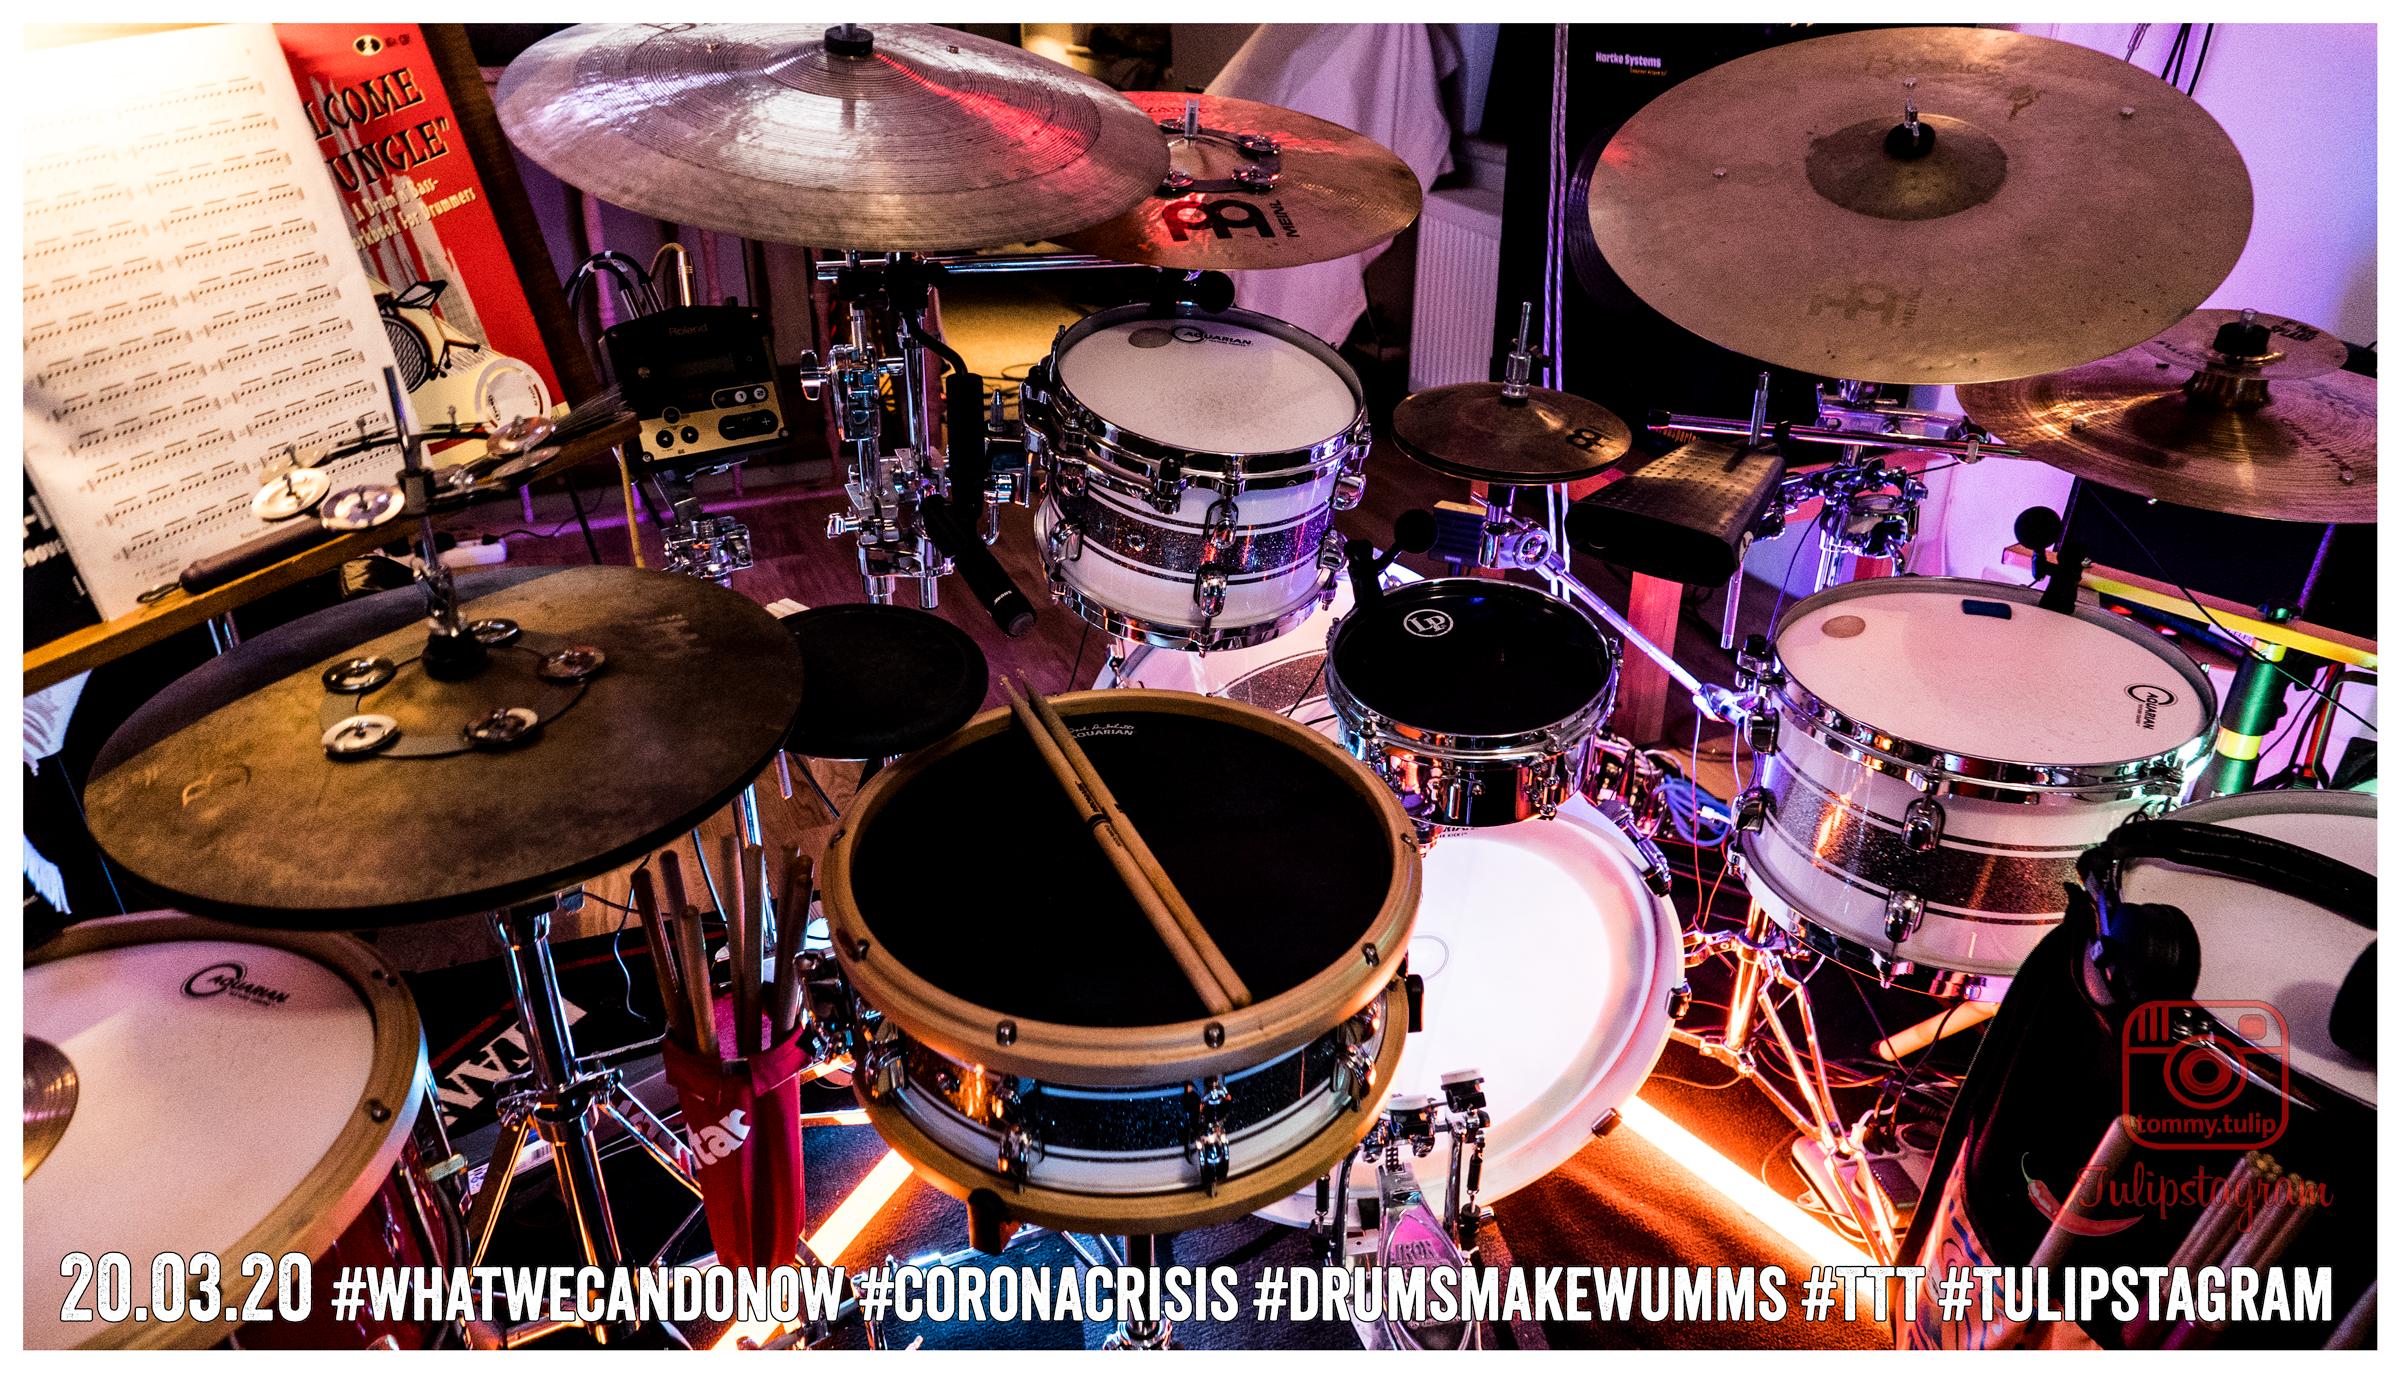 20.03.20 #Whatwecandonow #Coronacrisis #drumsmakewumms #TTT #Tulipstagram